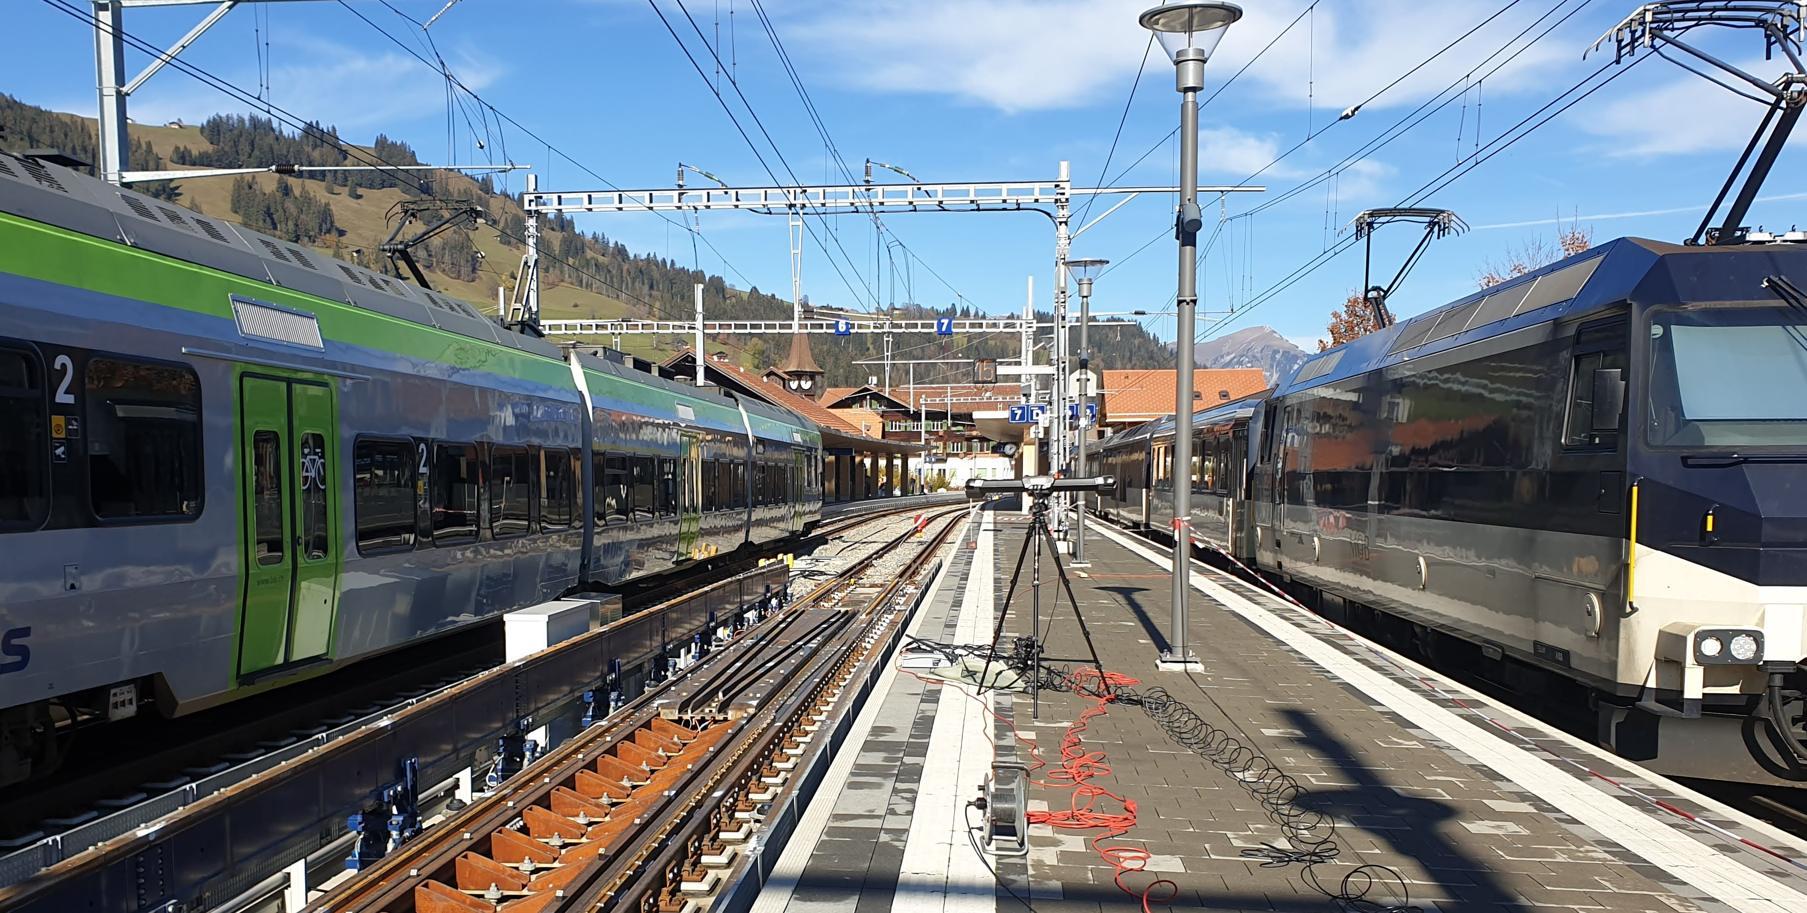 C-Track on atrain station platform between two trains